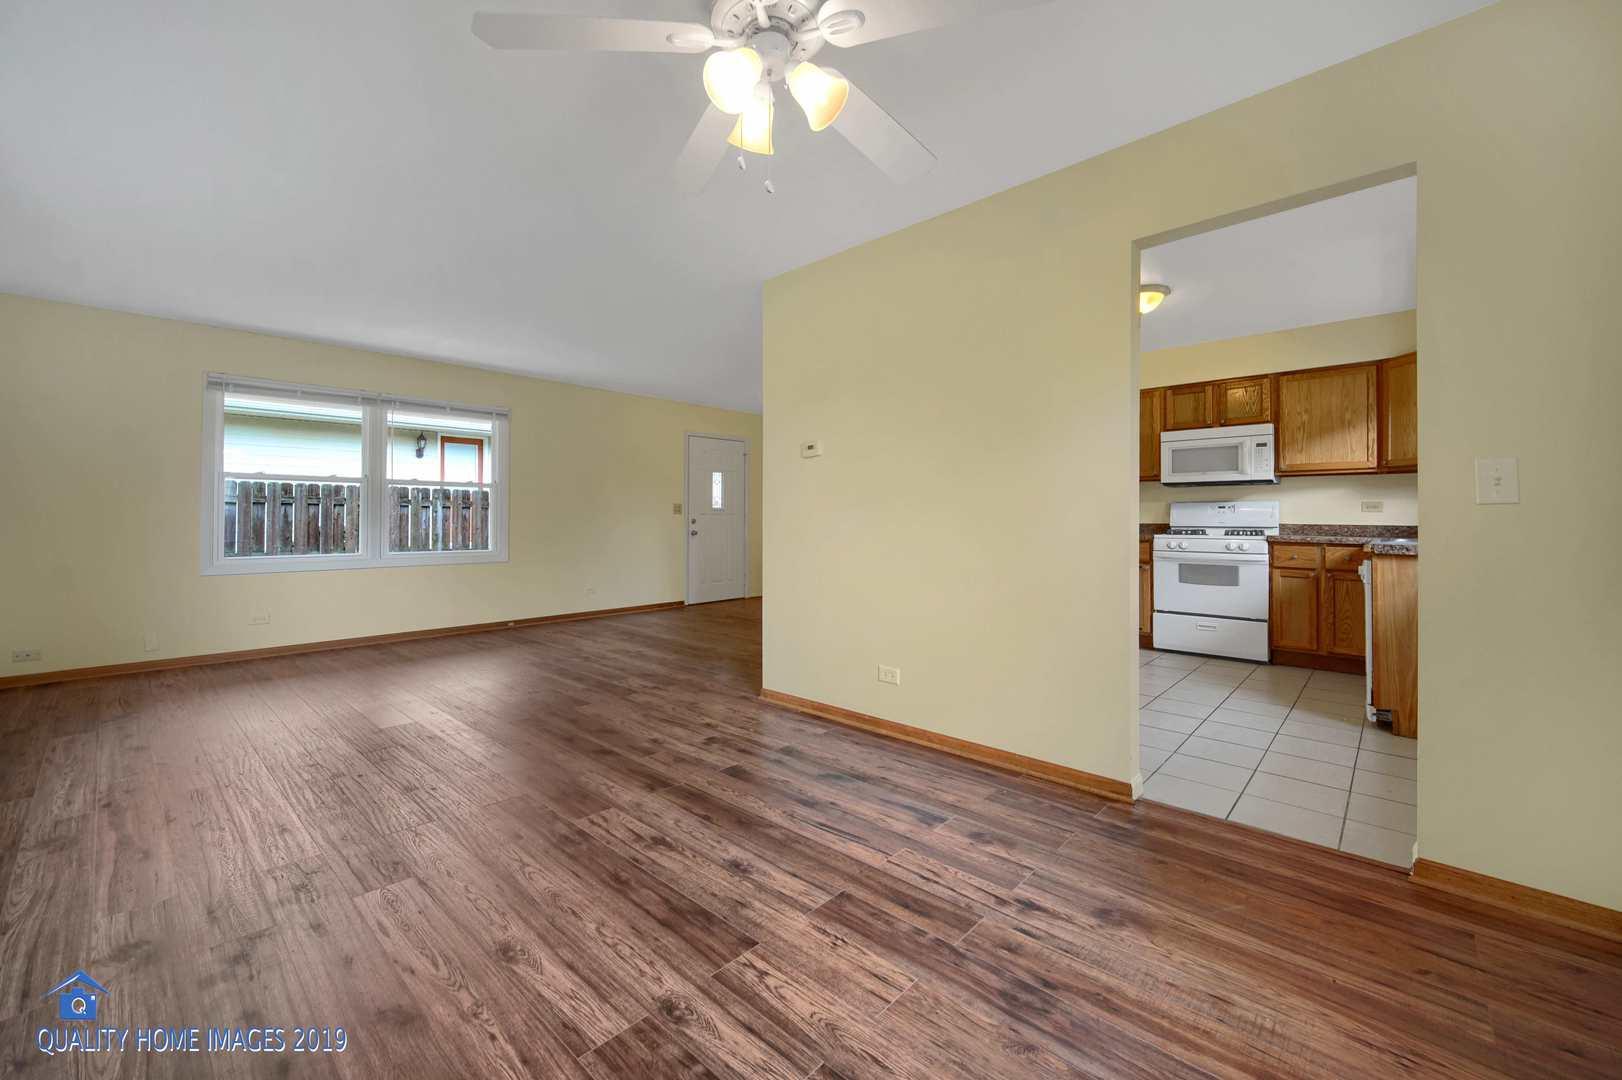 221 FERNDALE, ROUND LAKE BEACH, Illinois, 60073